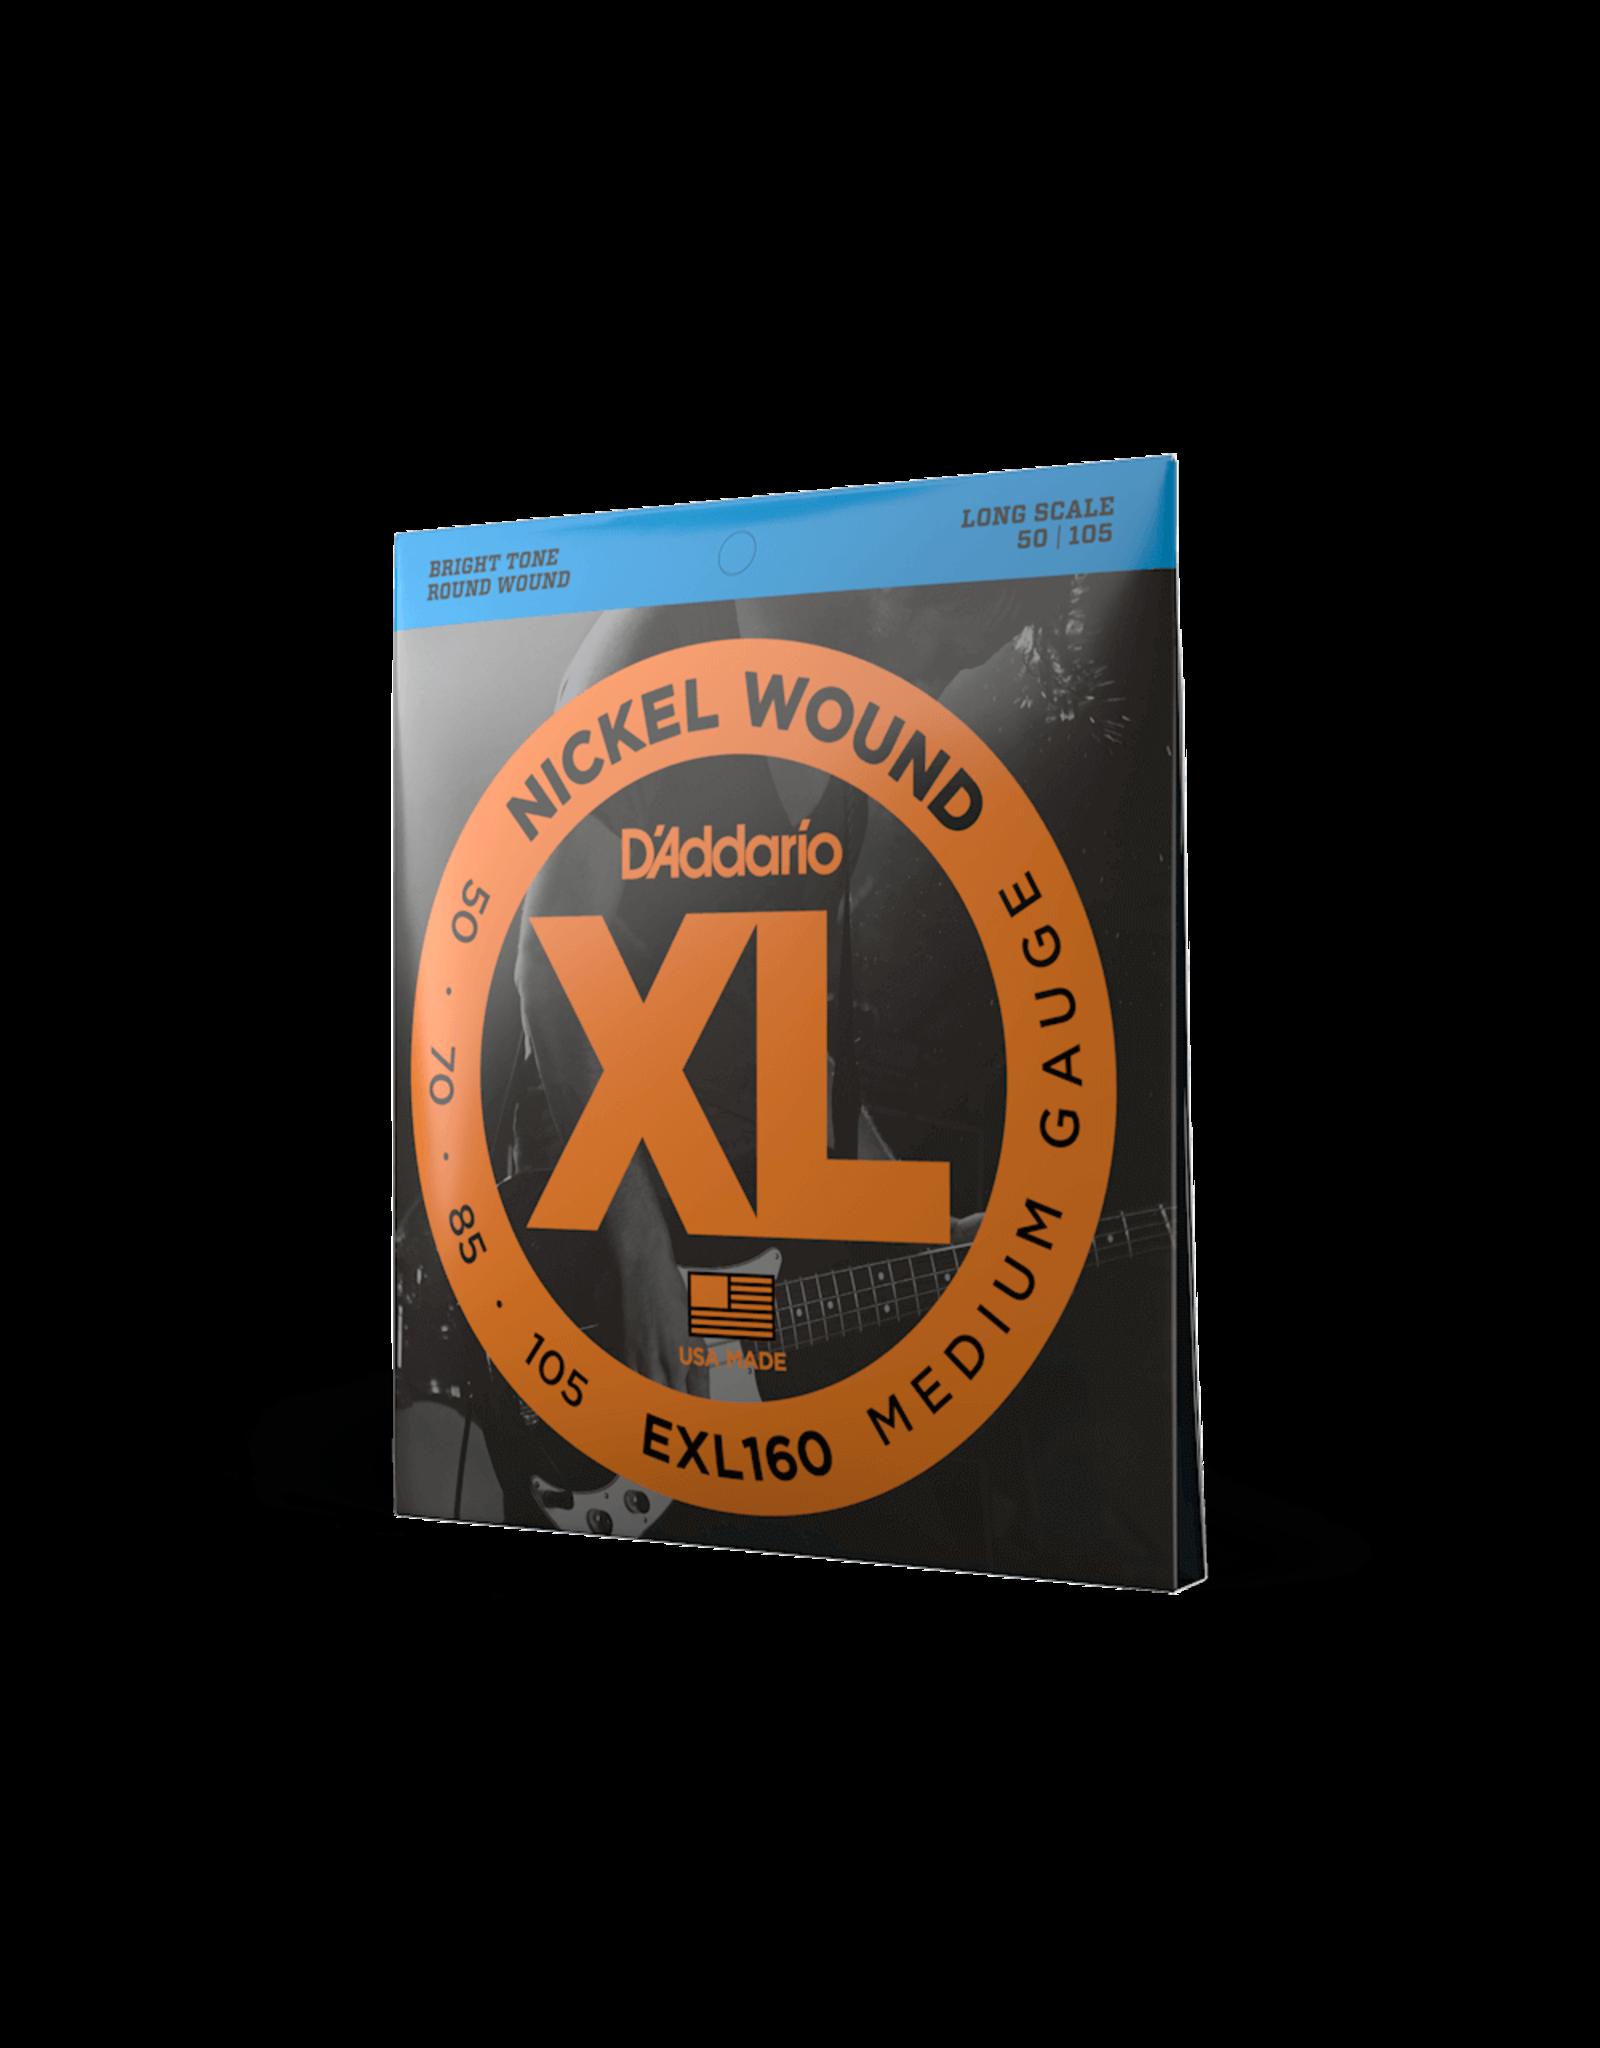 D'Addario D'Addario EXL160 Nickel Wound Bass, Medium, 50-105, Long Scale